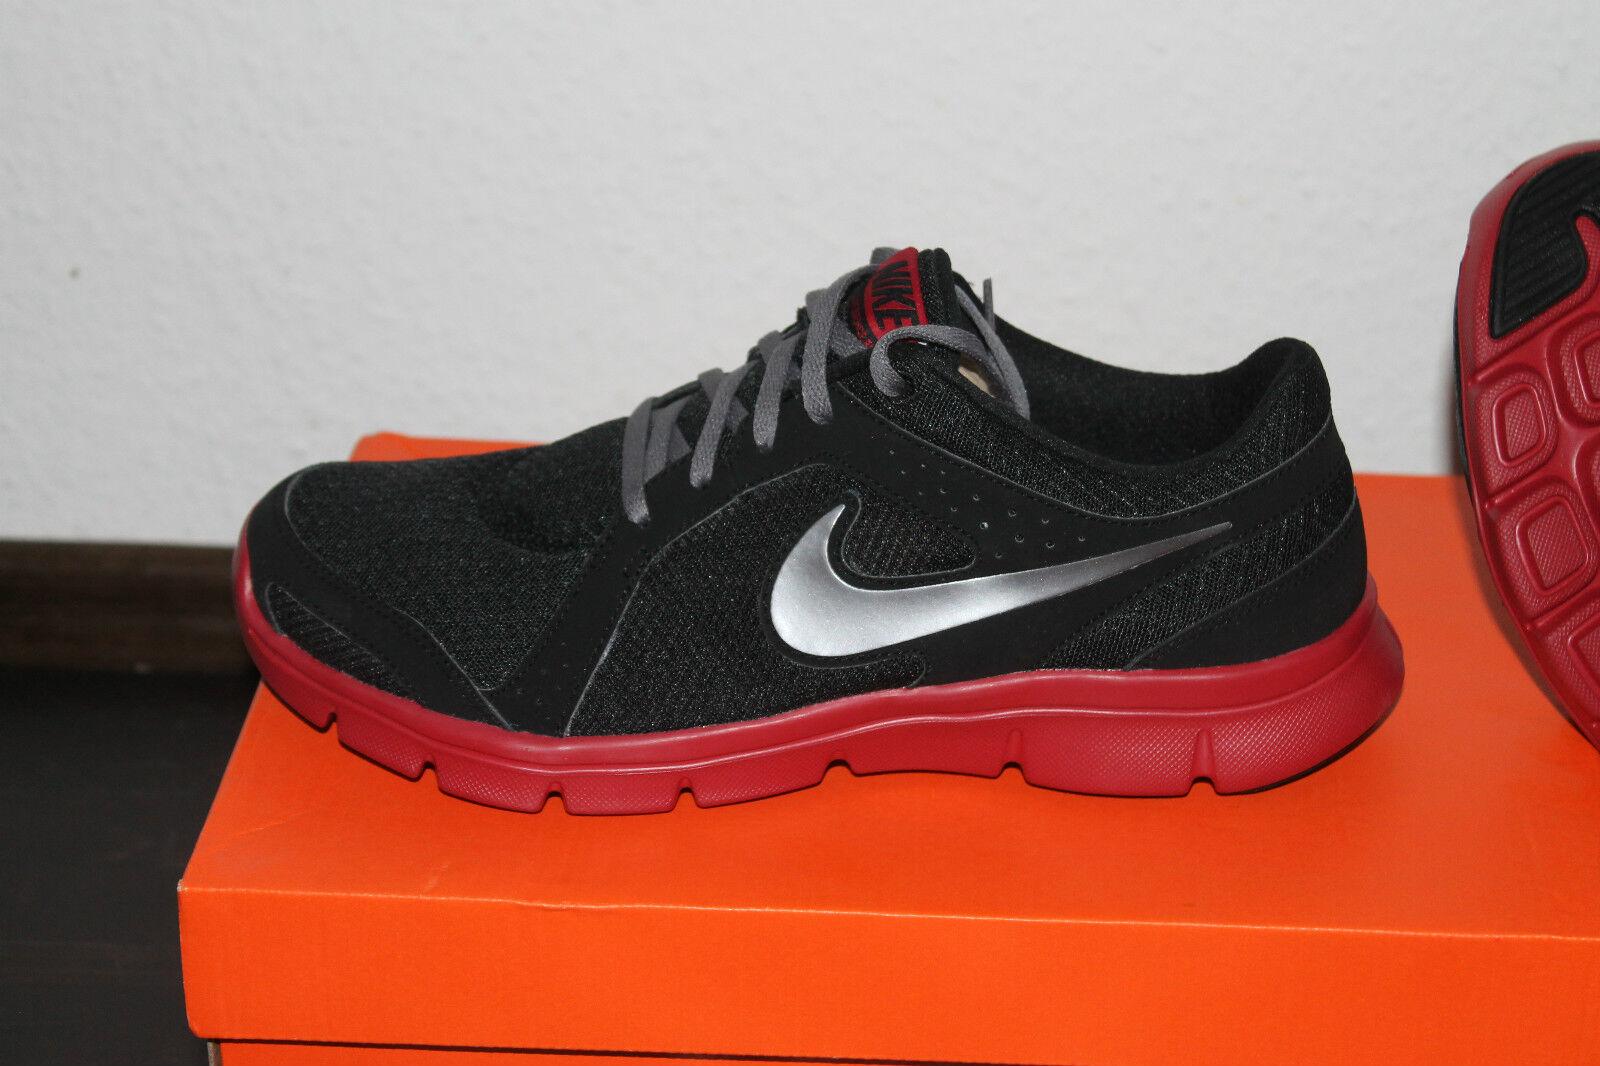 Nike Flessibile Running-uomo Training Scarpa Taglia 42,5, US 9 Nero Rosso